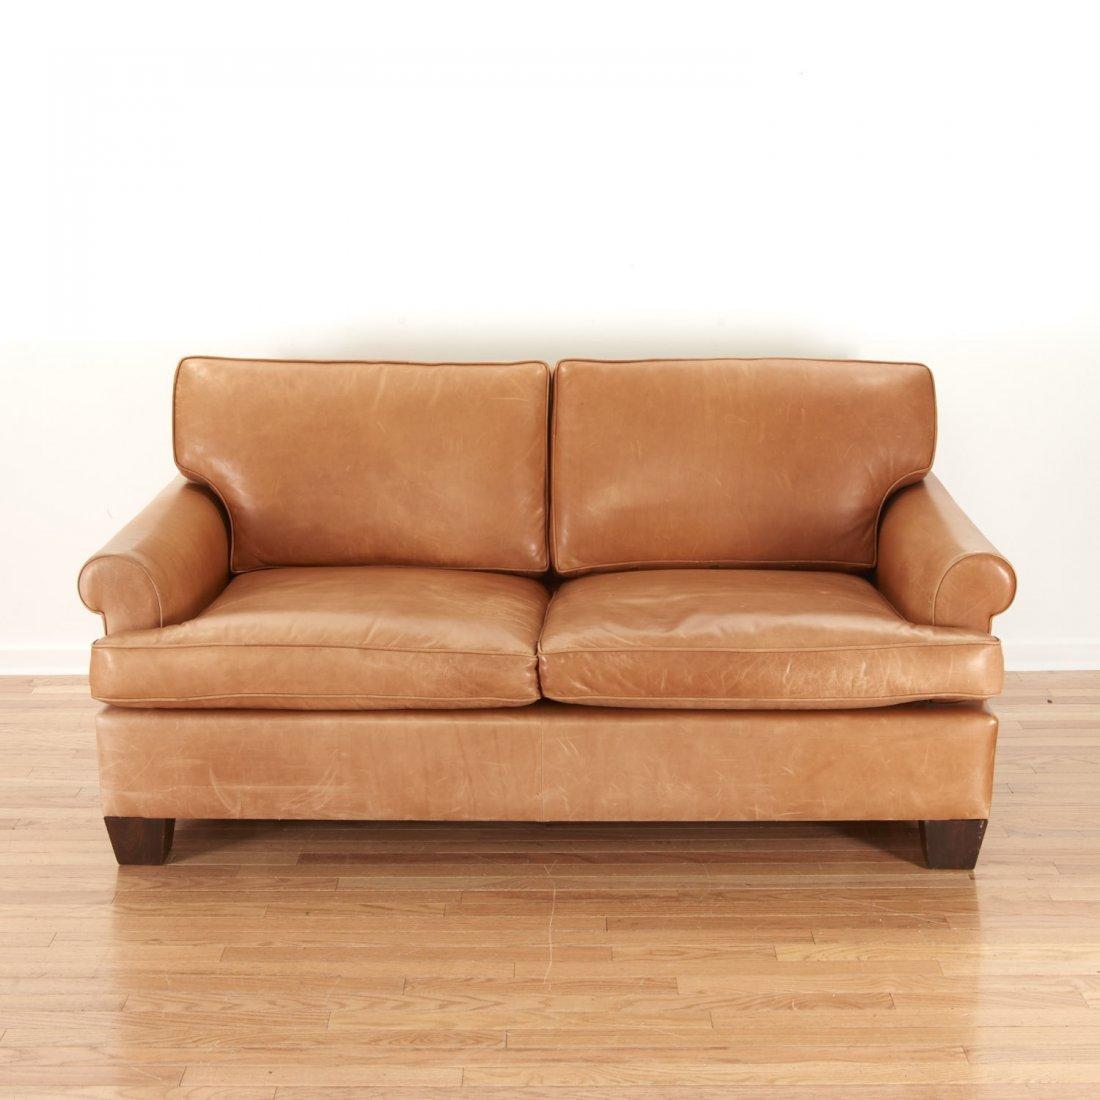 Nice Borge Mogensen style leather sleeper sofa